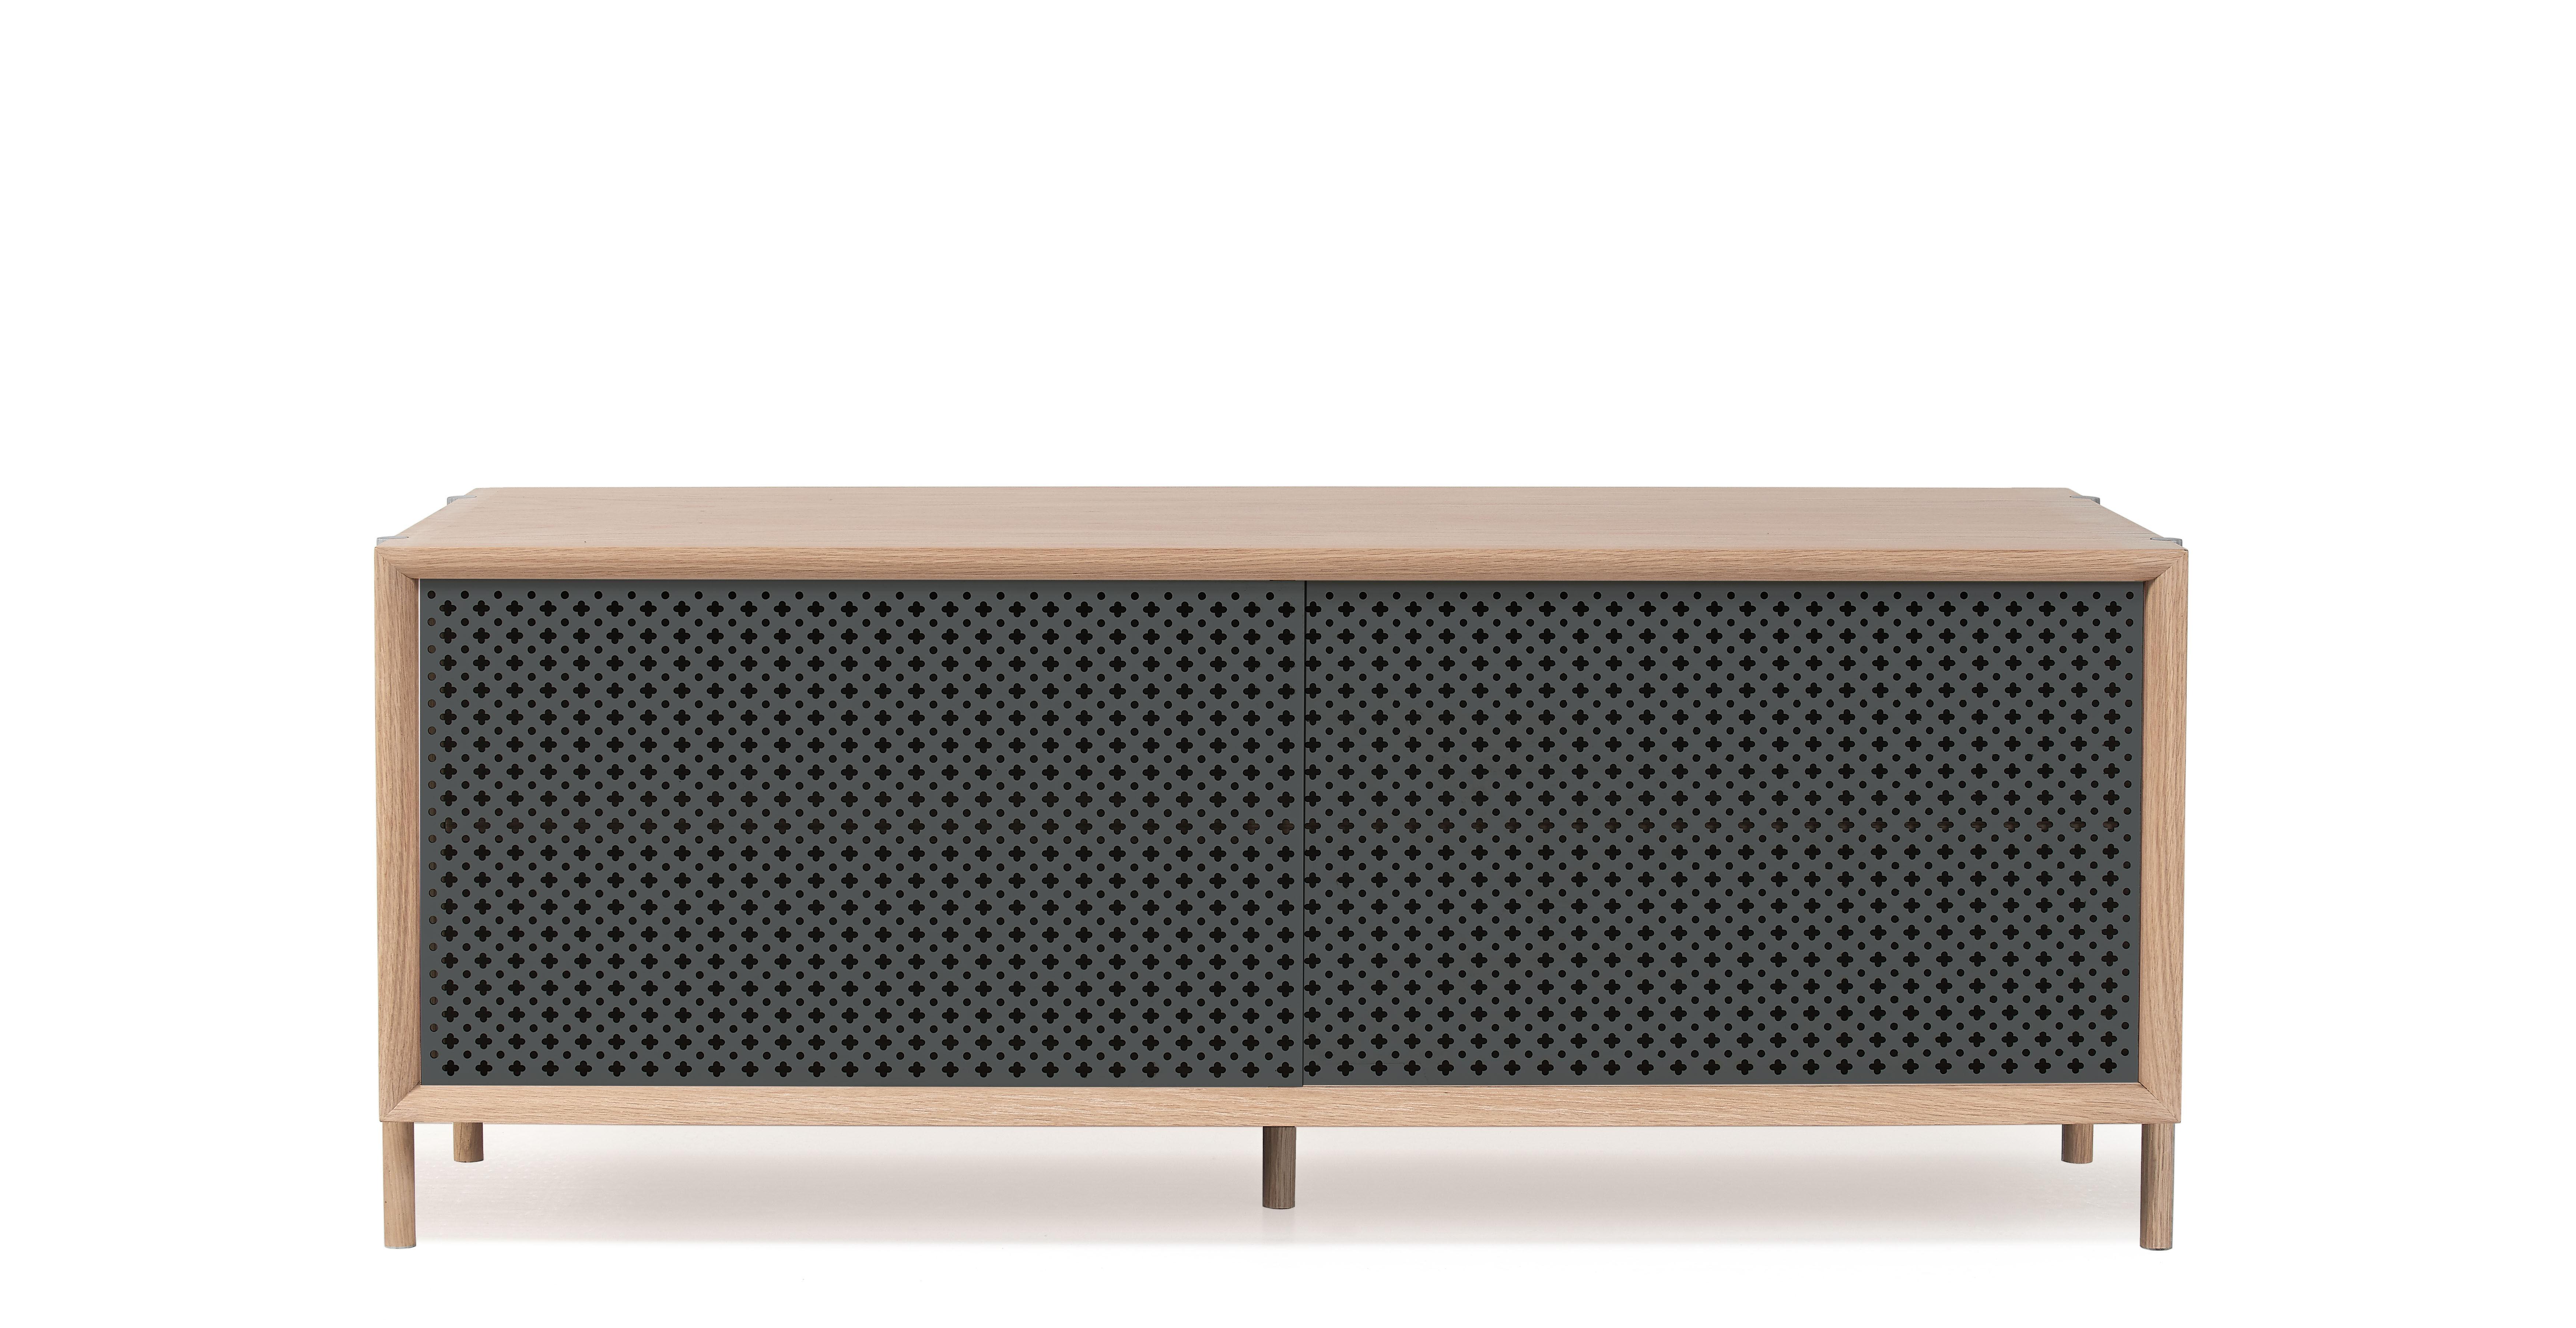 Furniture - Dressers & Storage Units - Gabin Dresser - L 122 cm - Oak & metal by Hartô - Slate grey & oak - MDF veneer oak, Perforated metal, Solid oak